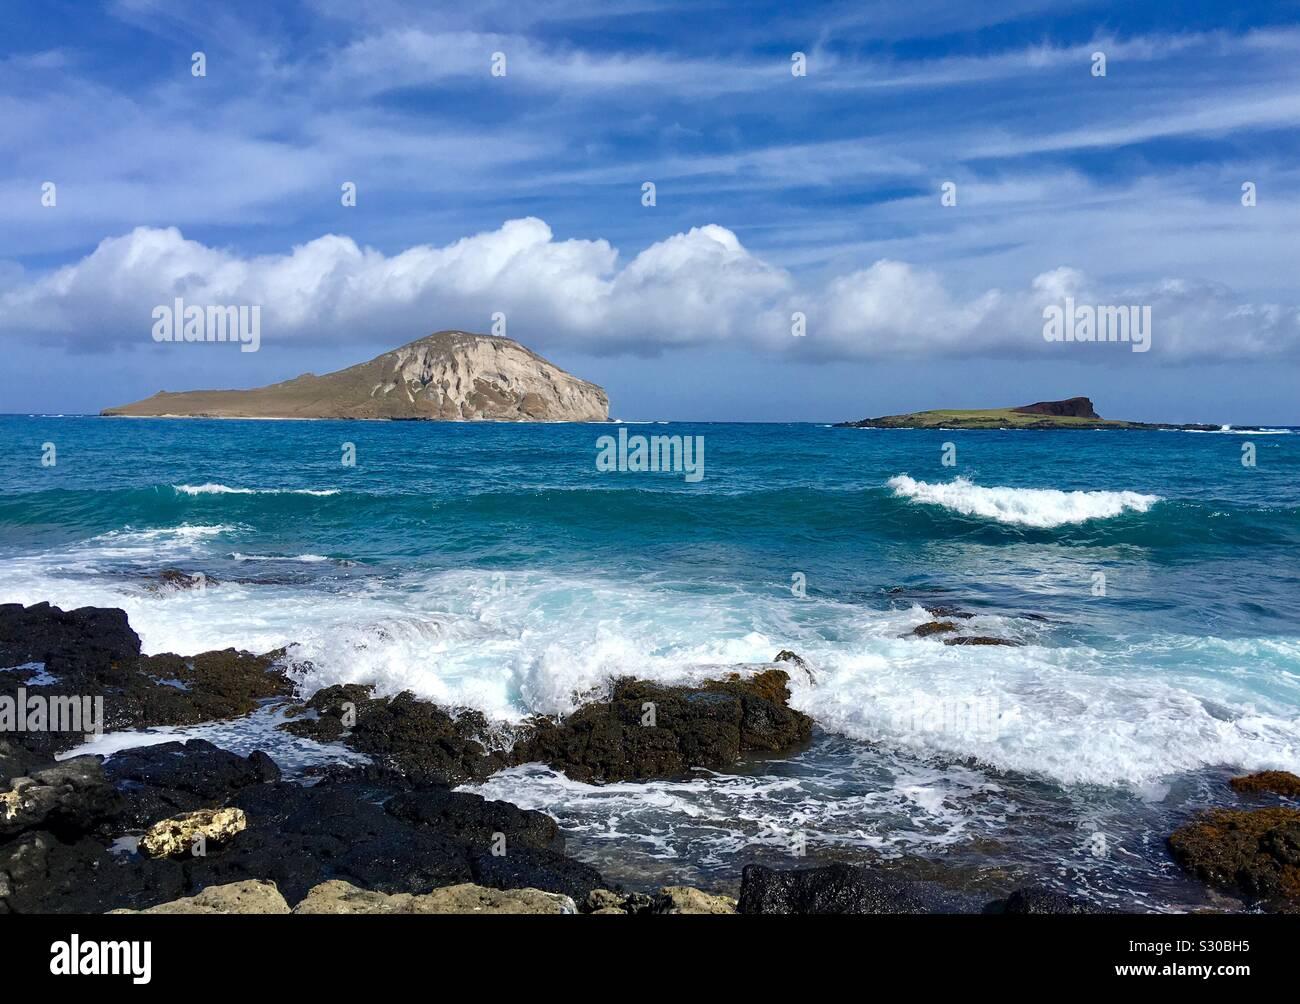 makapuu-beach-waimanalo-oahu-hawaii-S30B